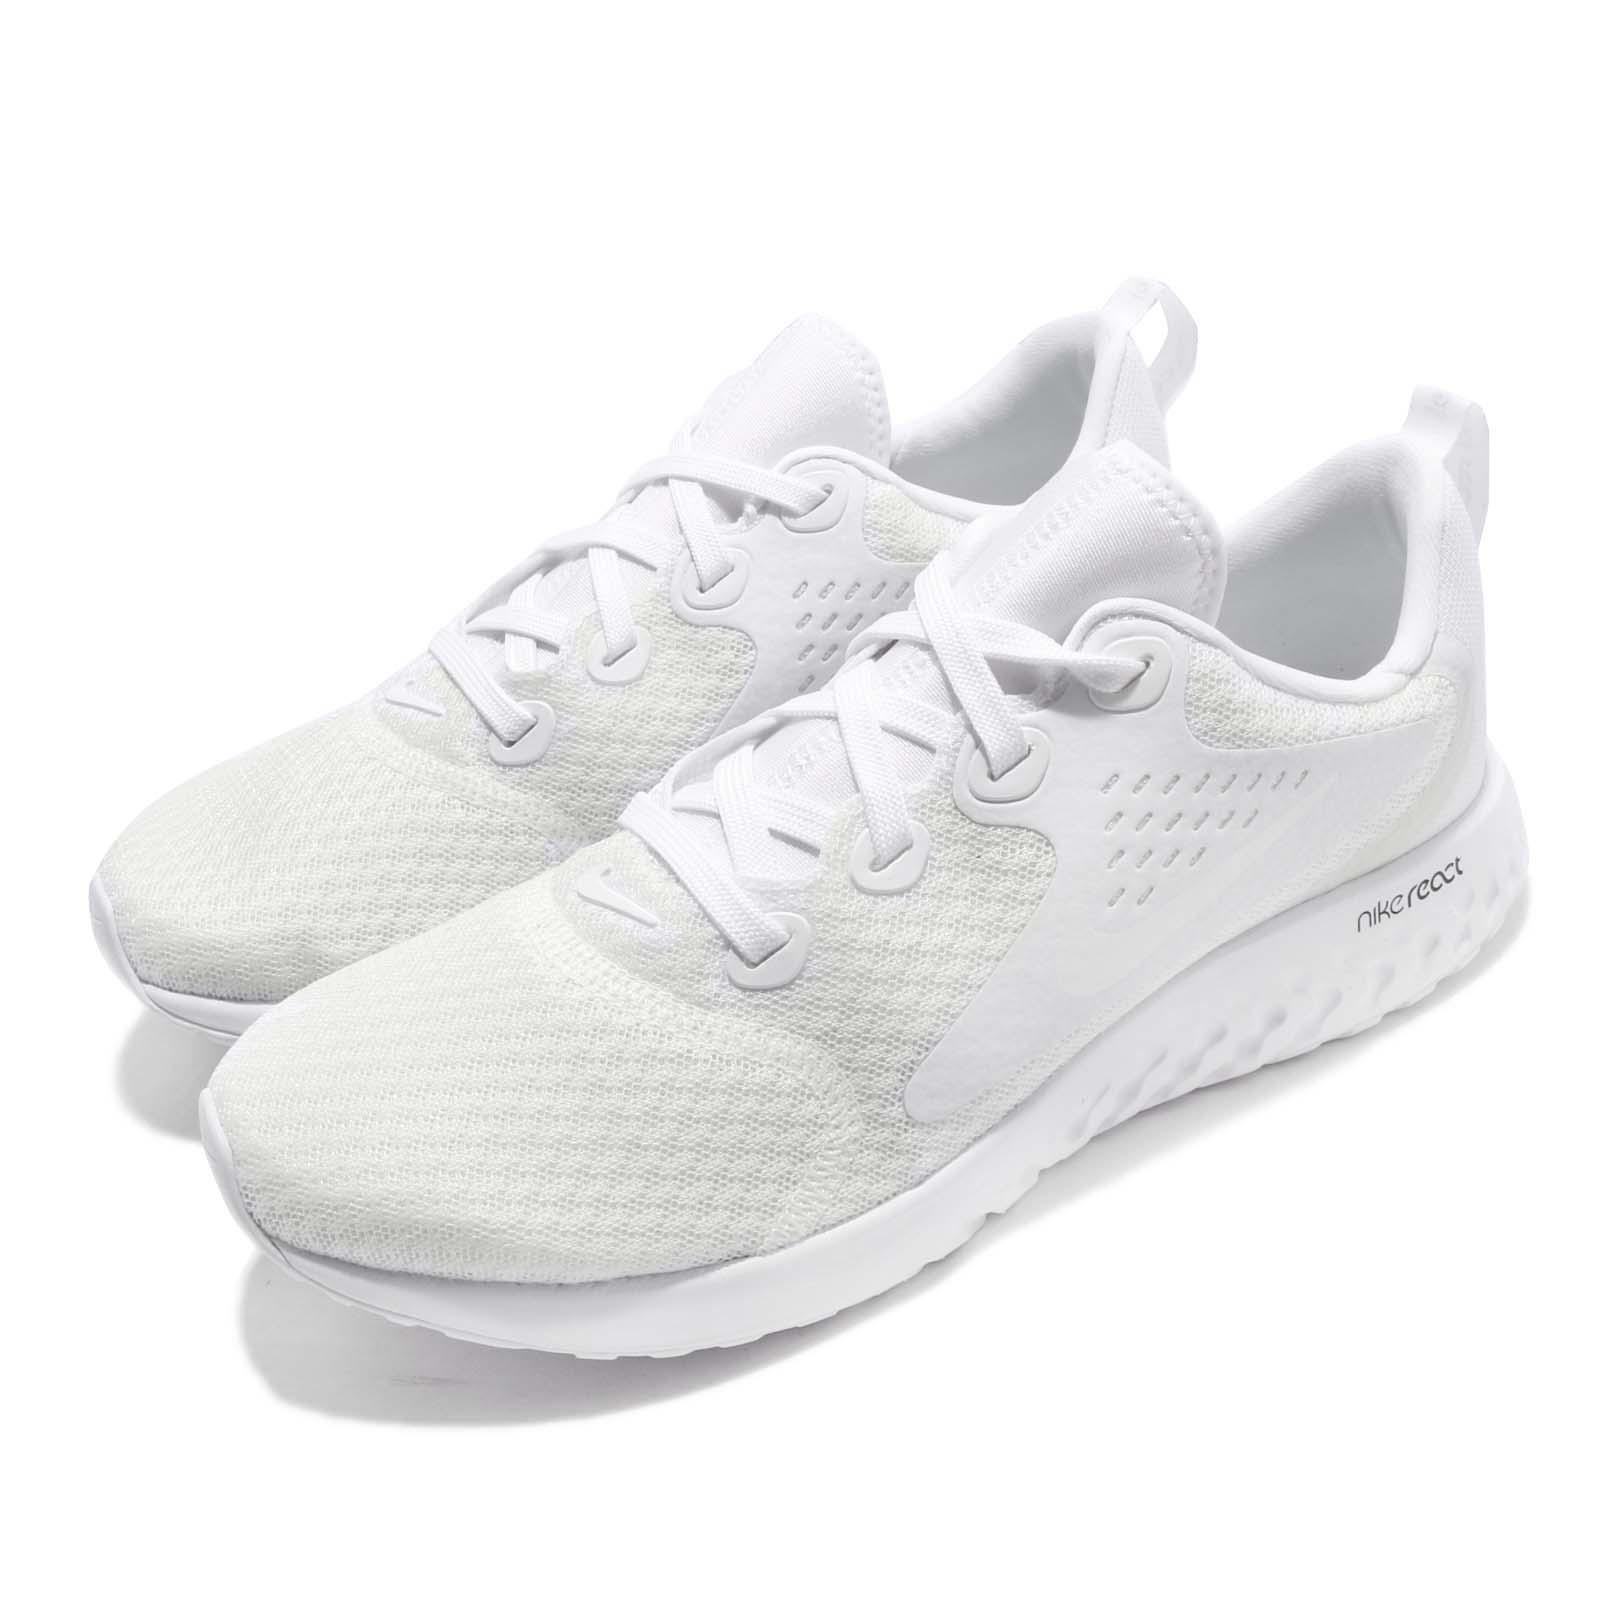 Nike 慢跑鞋 Legend React 女鞋 AH9438-100